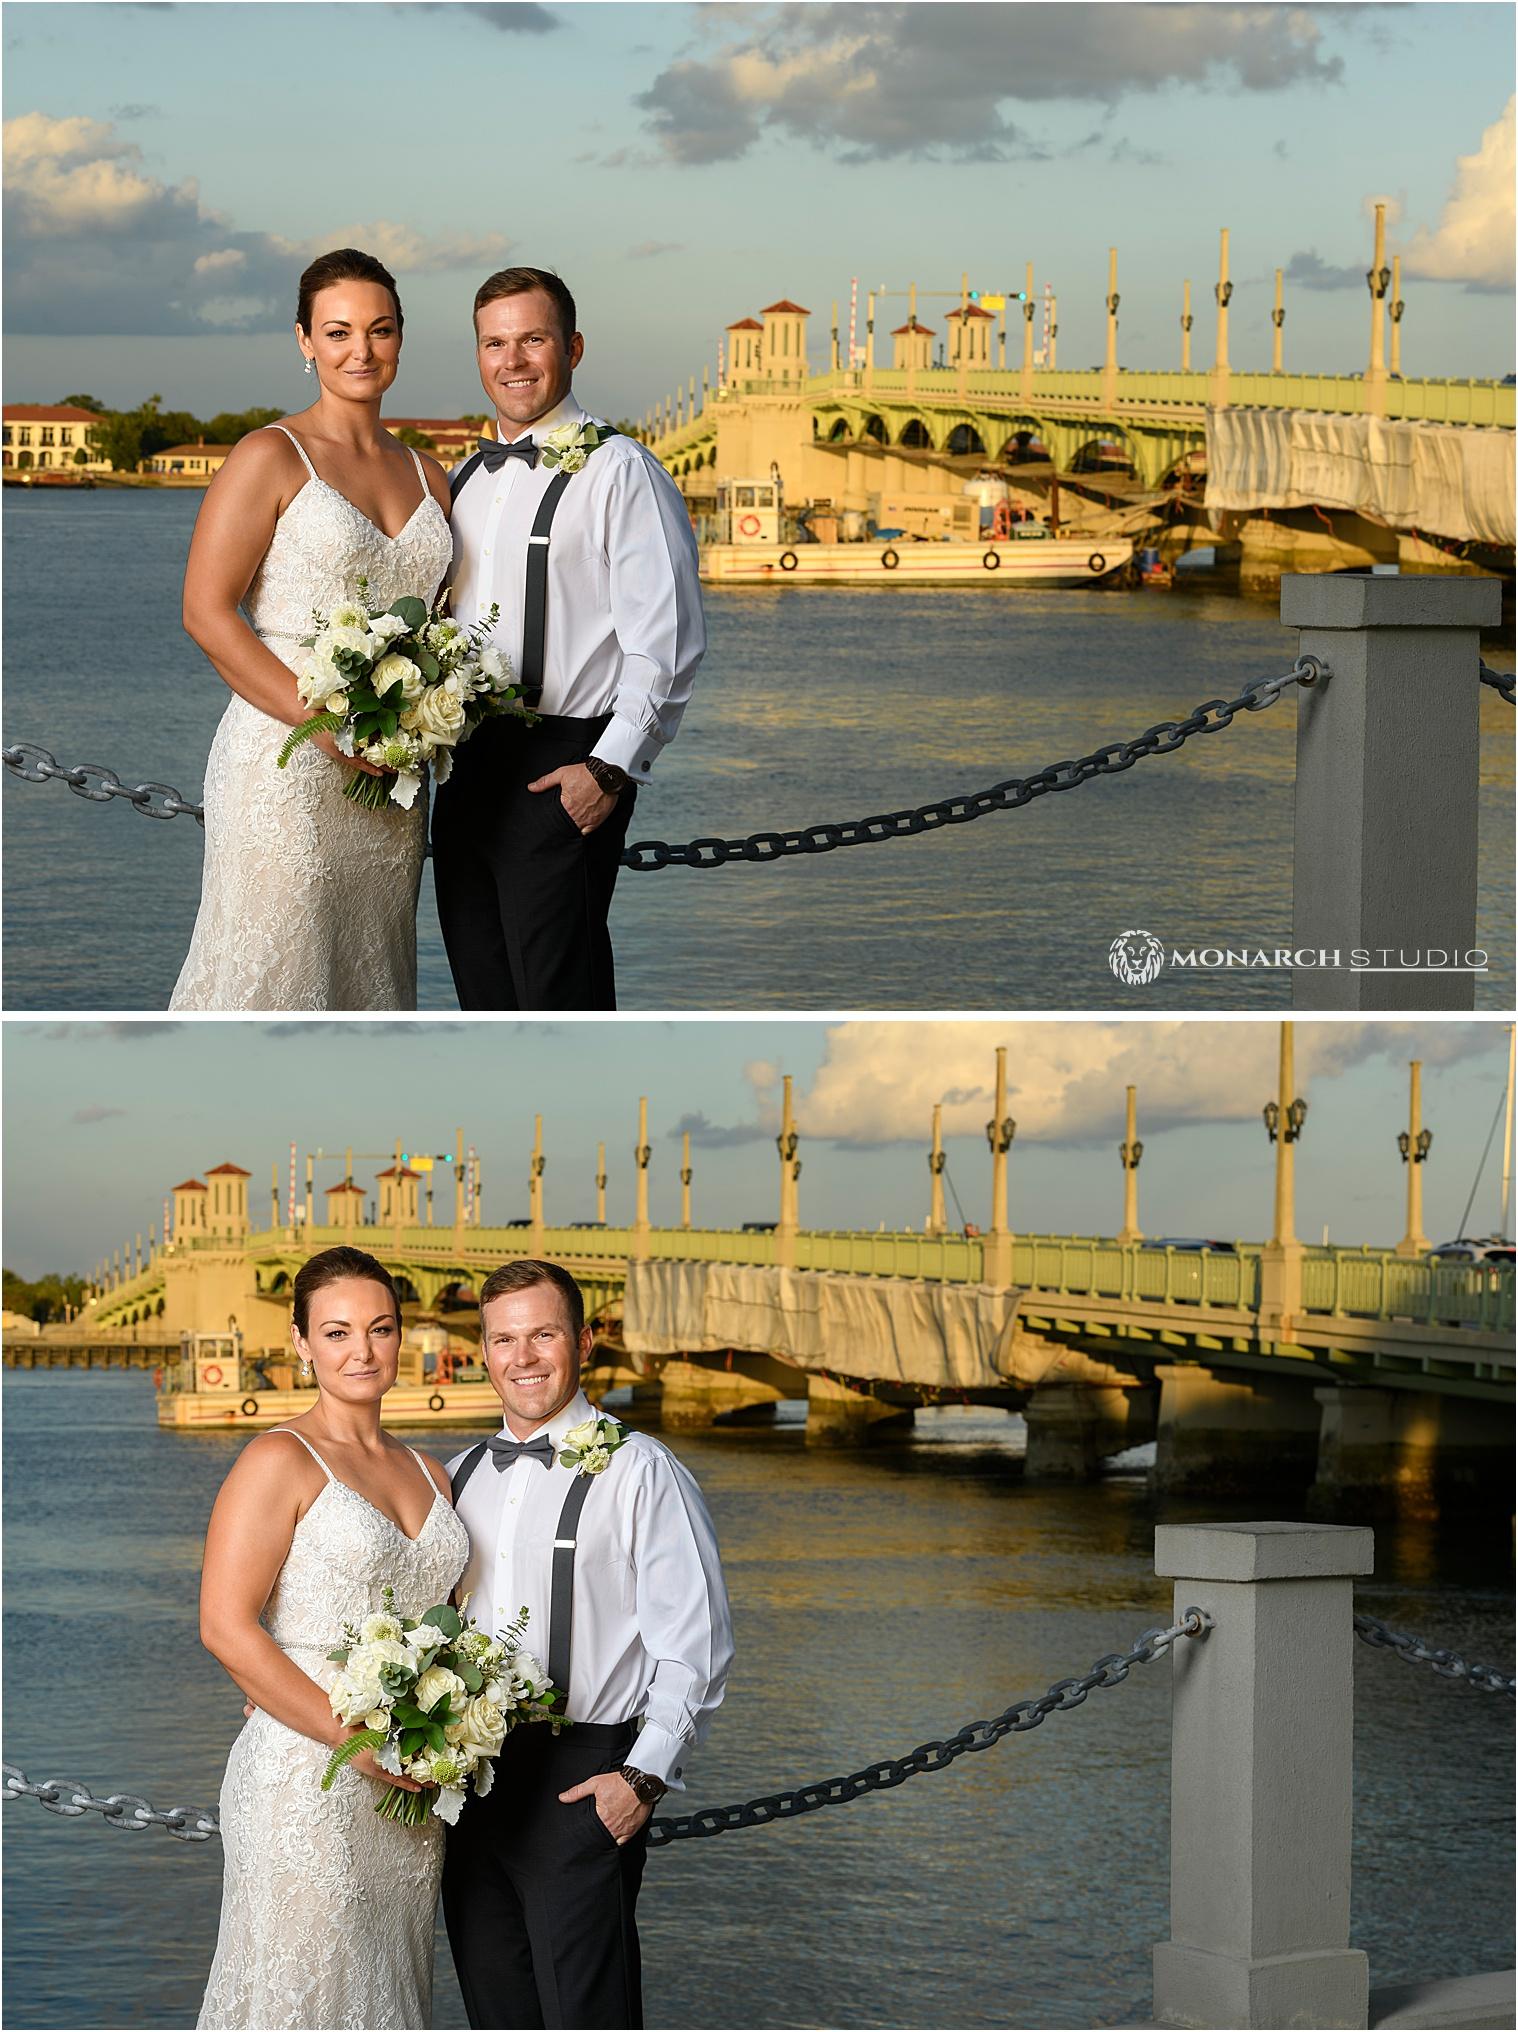 090-whiteroom-wedding-photographer-2019-05-22_0072.jpg